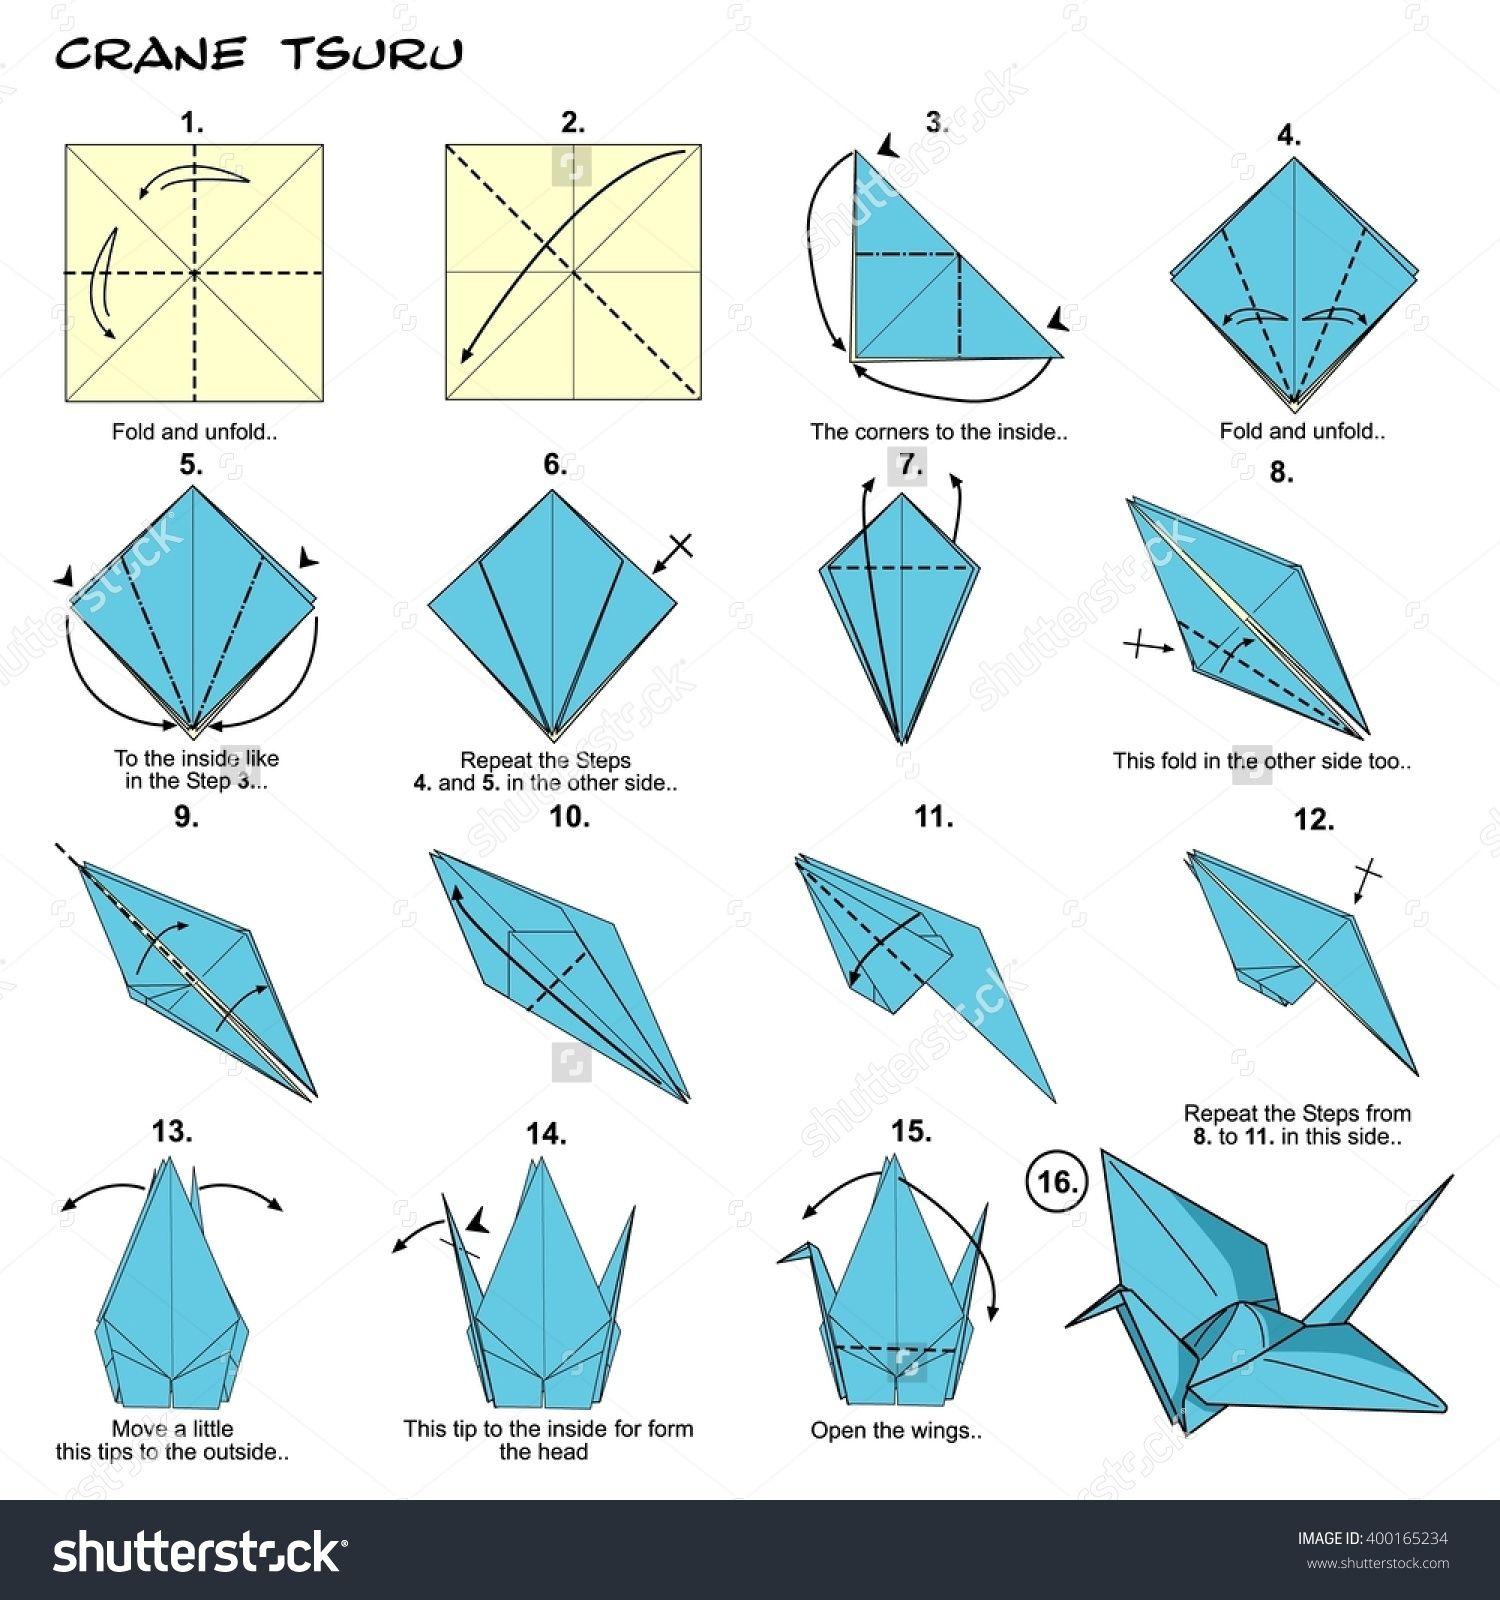 Origami step by step beautiful arts misc pinterest origami crane steps stock illustration shutterstock how to make a origami crane step by step how to make a origami crane out of gum wrapper pleasant how to jeuxipadfo Choice Image